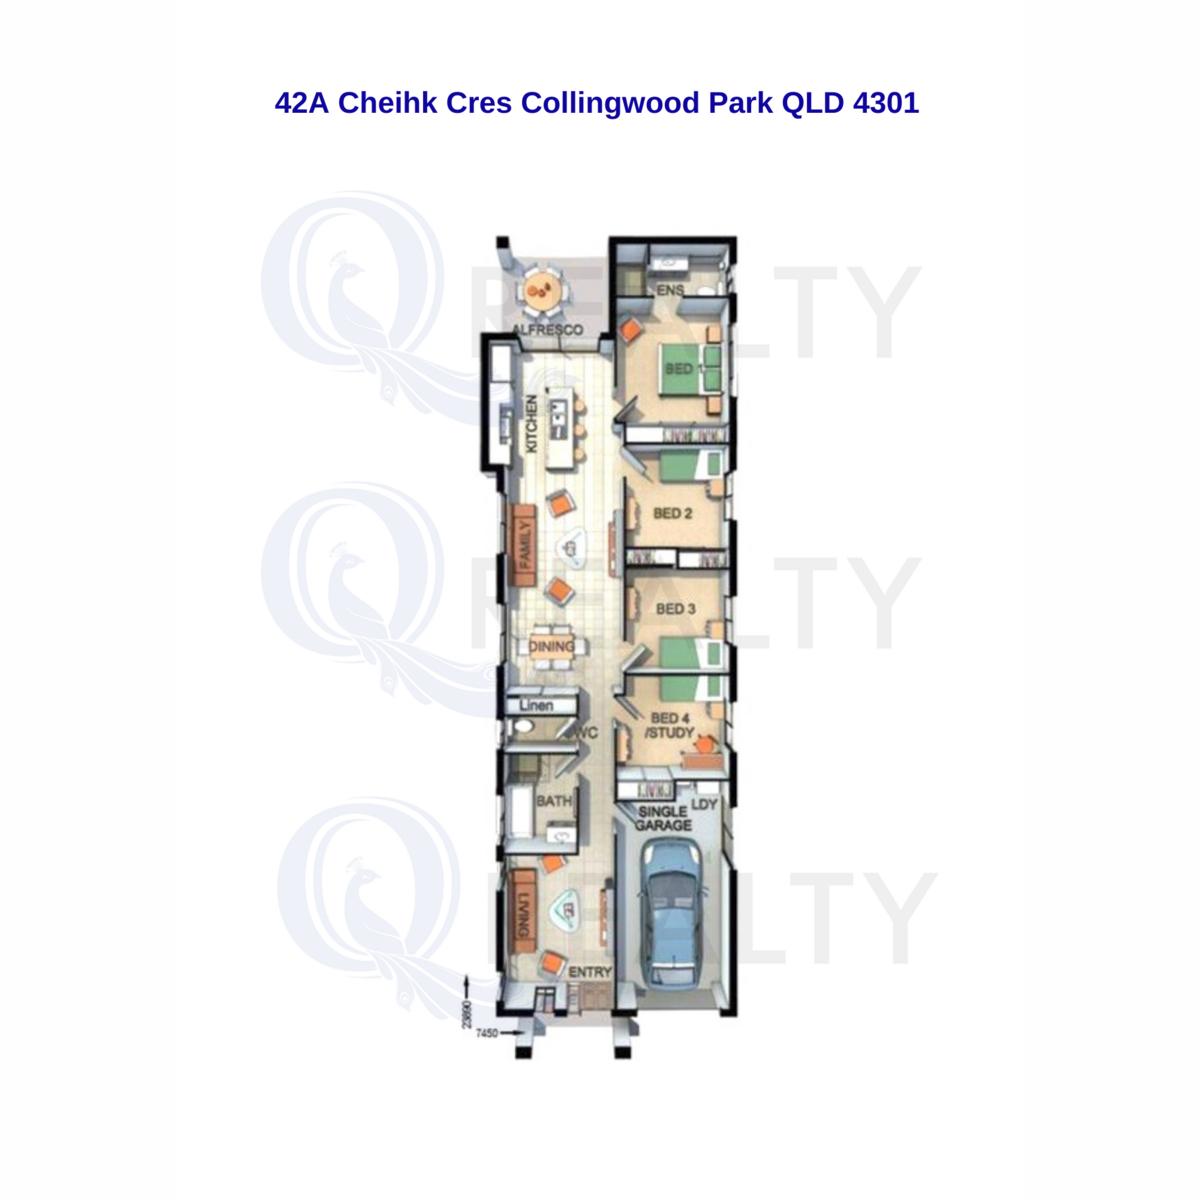 42A Cheihk Crescent, Collingwood Park  QLD  4301